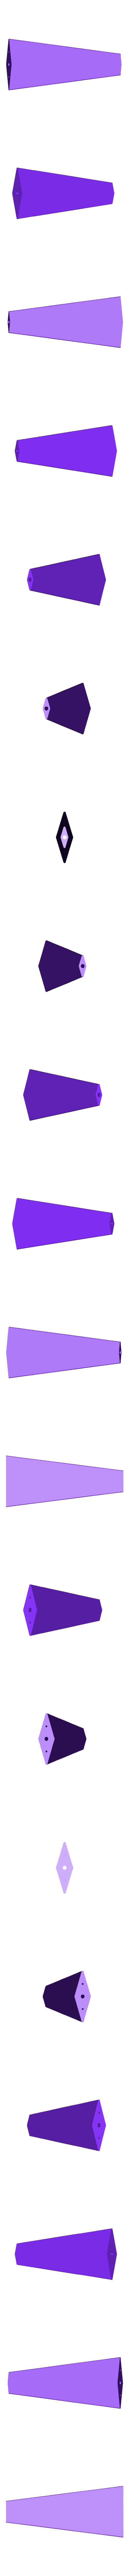 Sharpened Nail 5.stl Download STL file Hollow Knight Sharpened Nail • 3D printable design, glargonoid